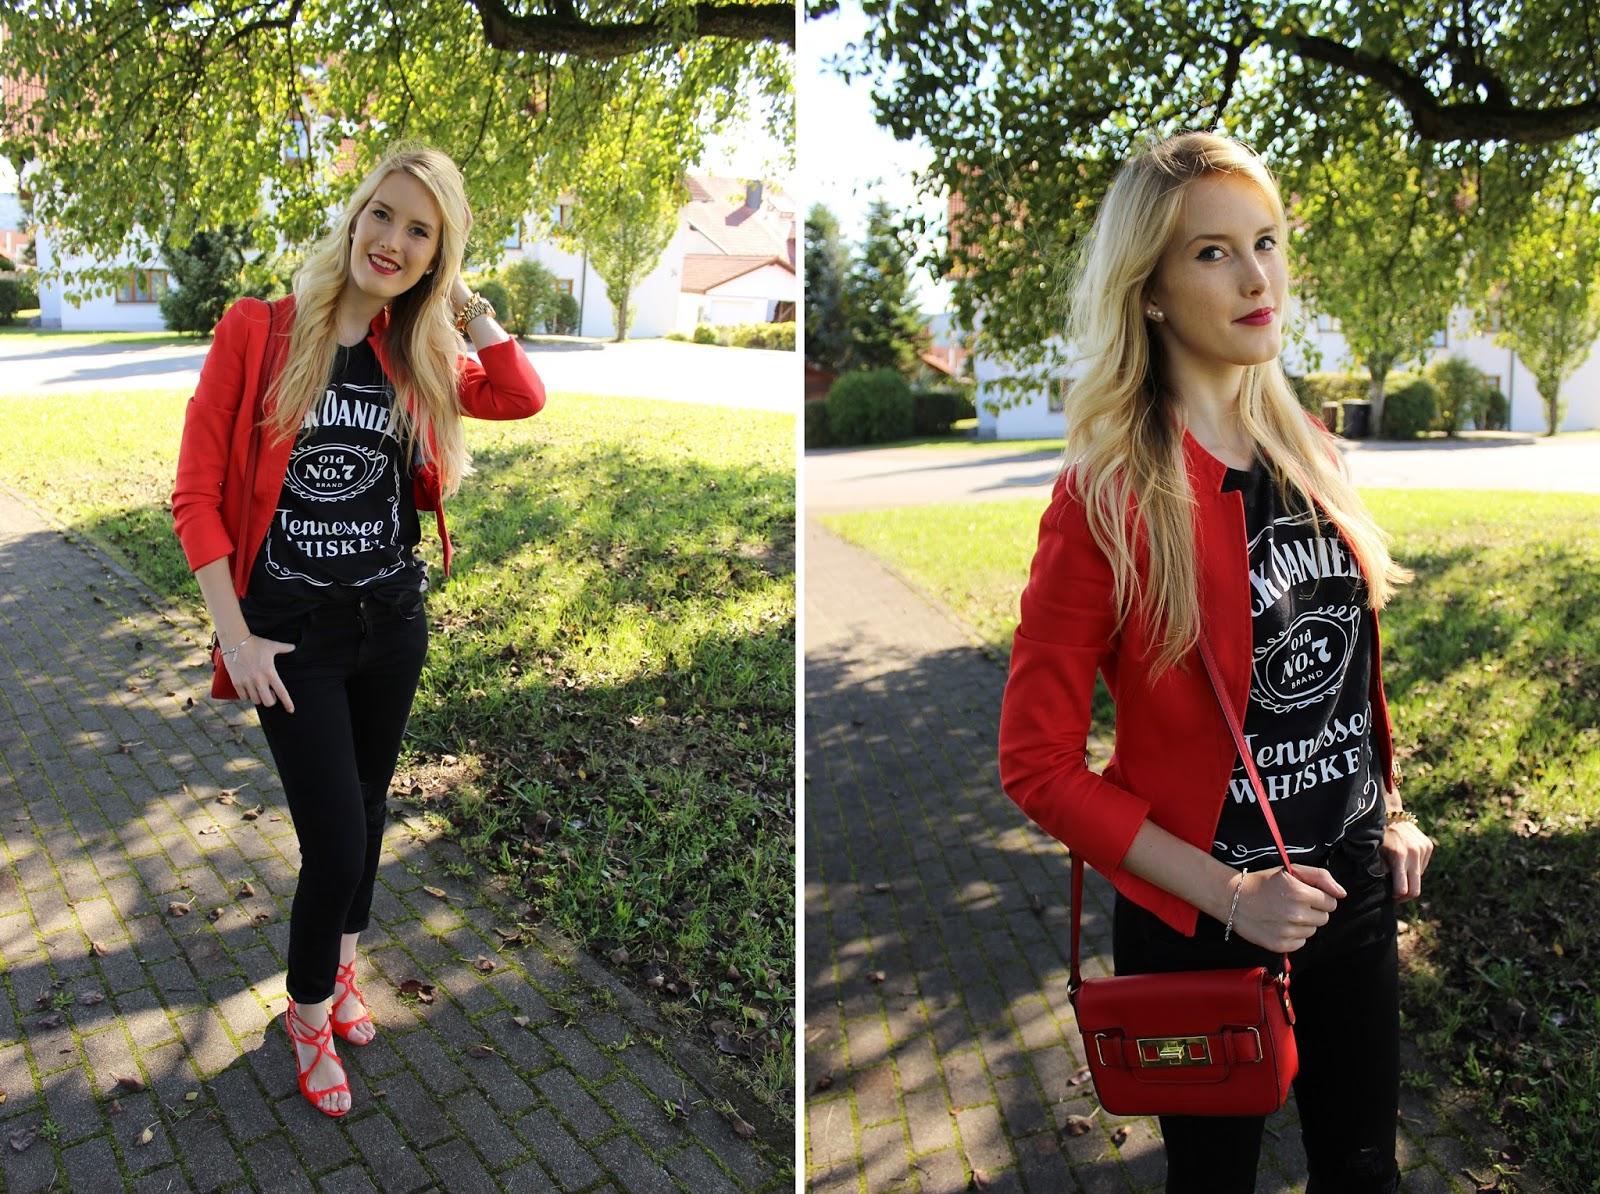 TheBlondeLion Outfit JackDaniels Heels Schuhtempel24 Sandalen Rot